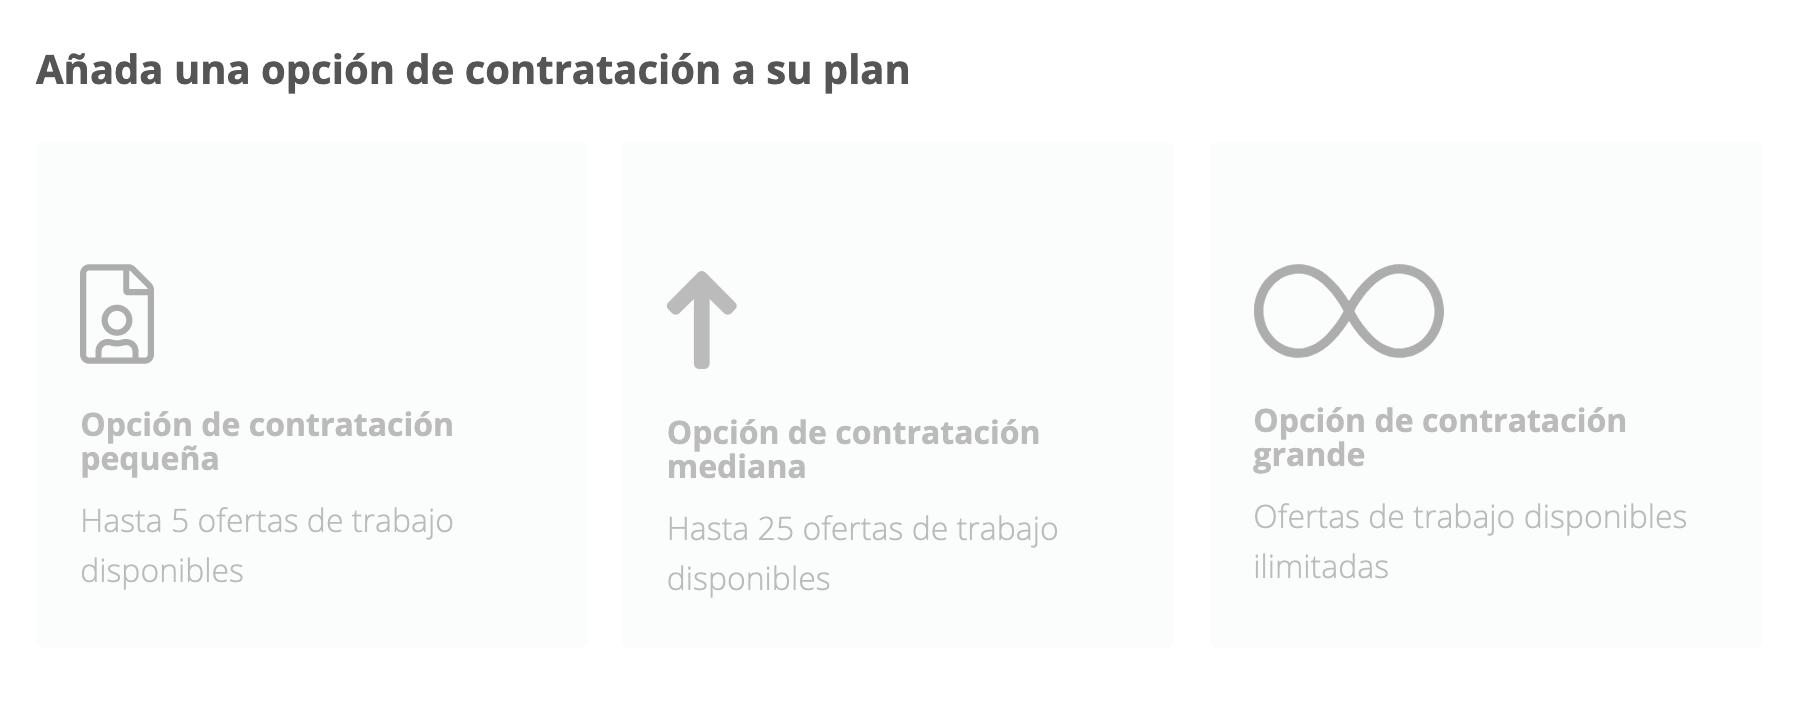 choosing-plans-recruiting-option_es.png